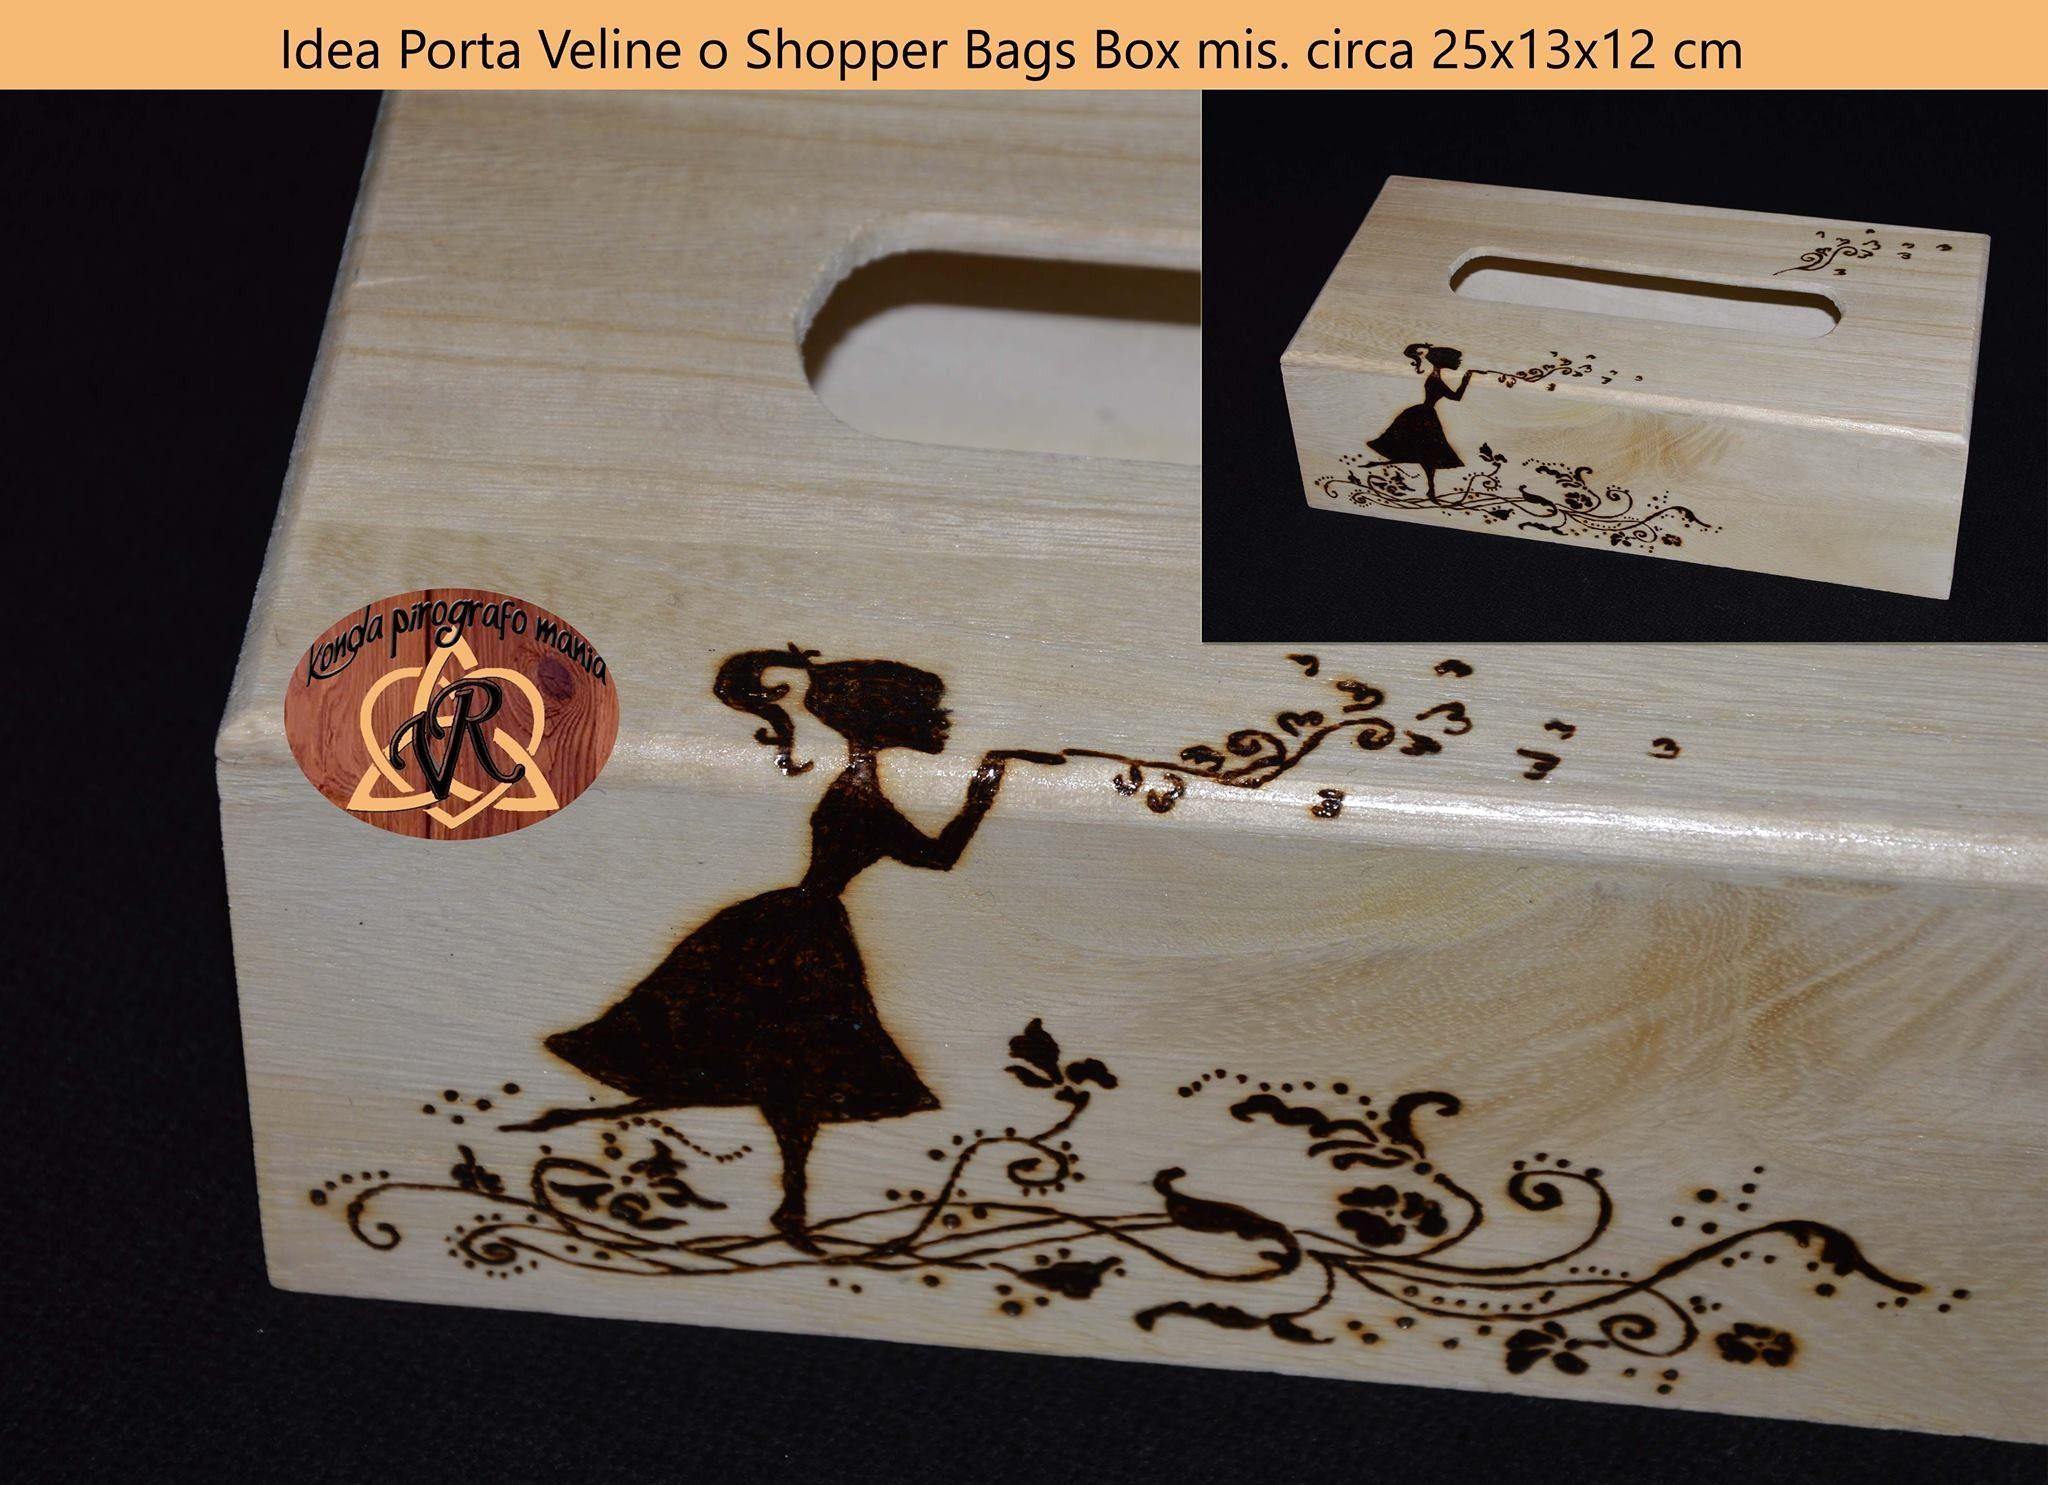 Portaveline o Shopper Bags Box mis circa cm 22x13x12